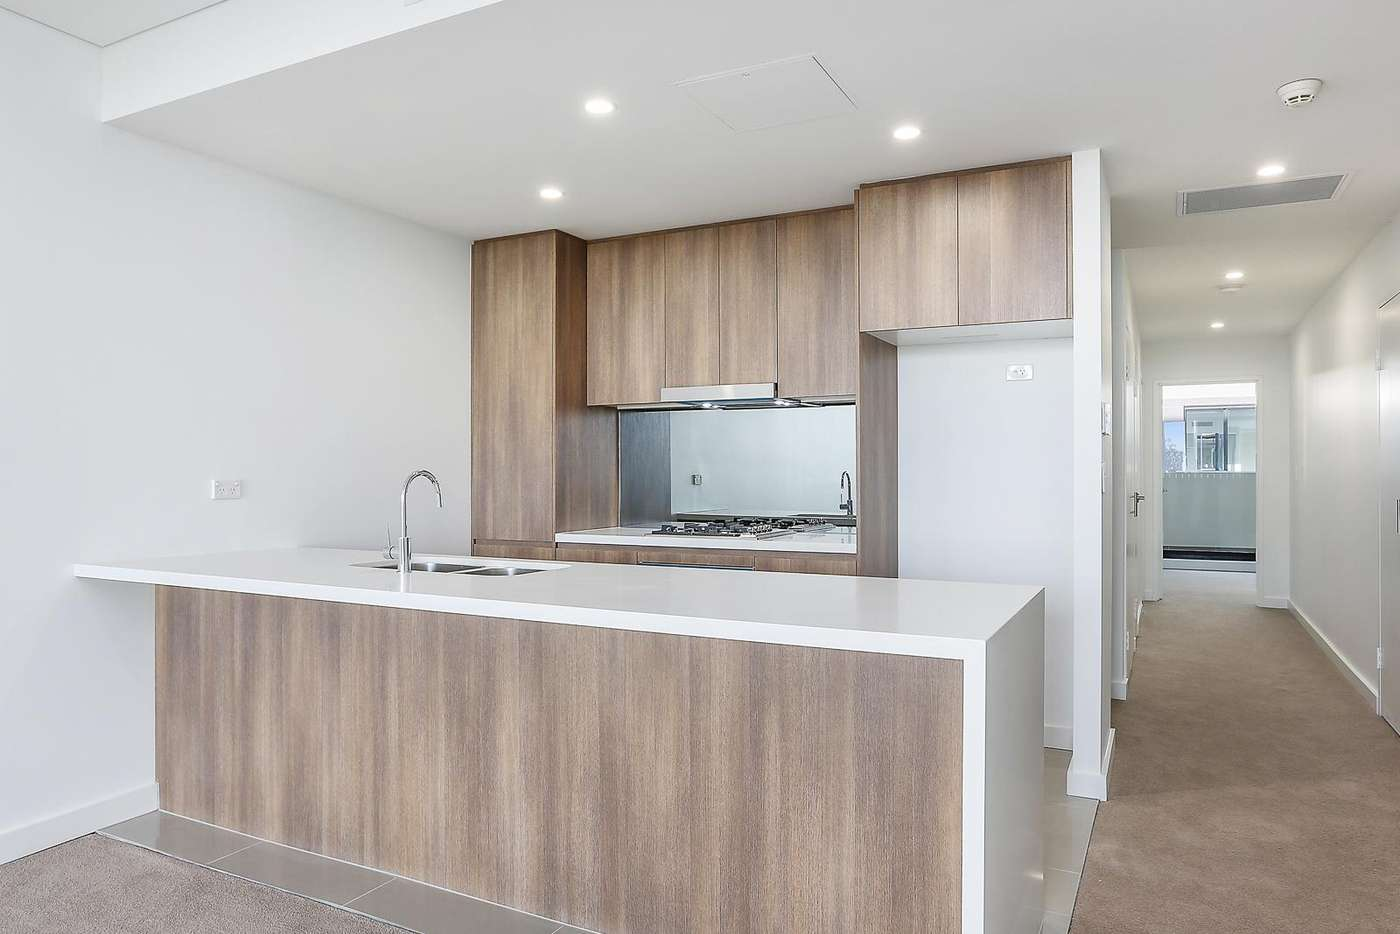 Main view of Homely apartment listing, A301/16-20 Pinnacle Street, Miranda NSW 2228